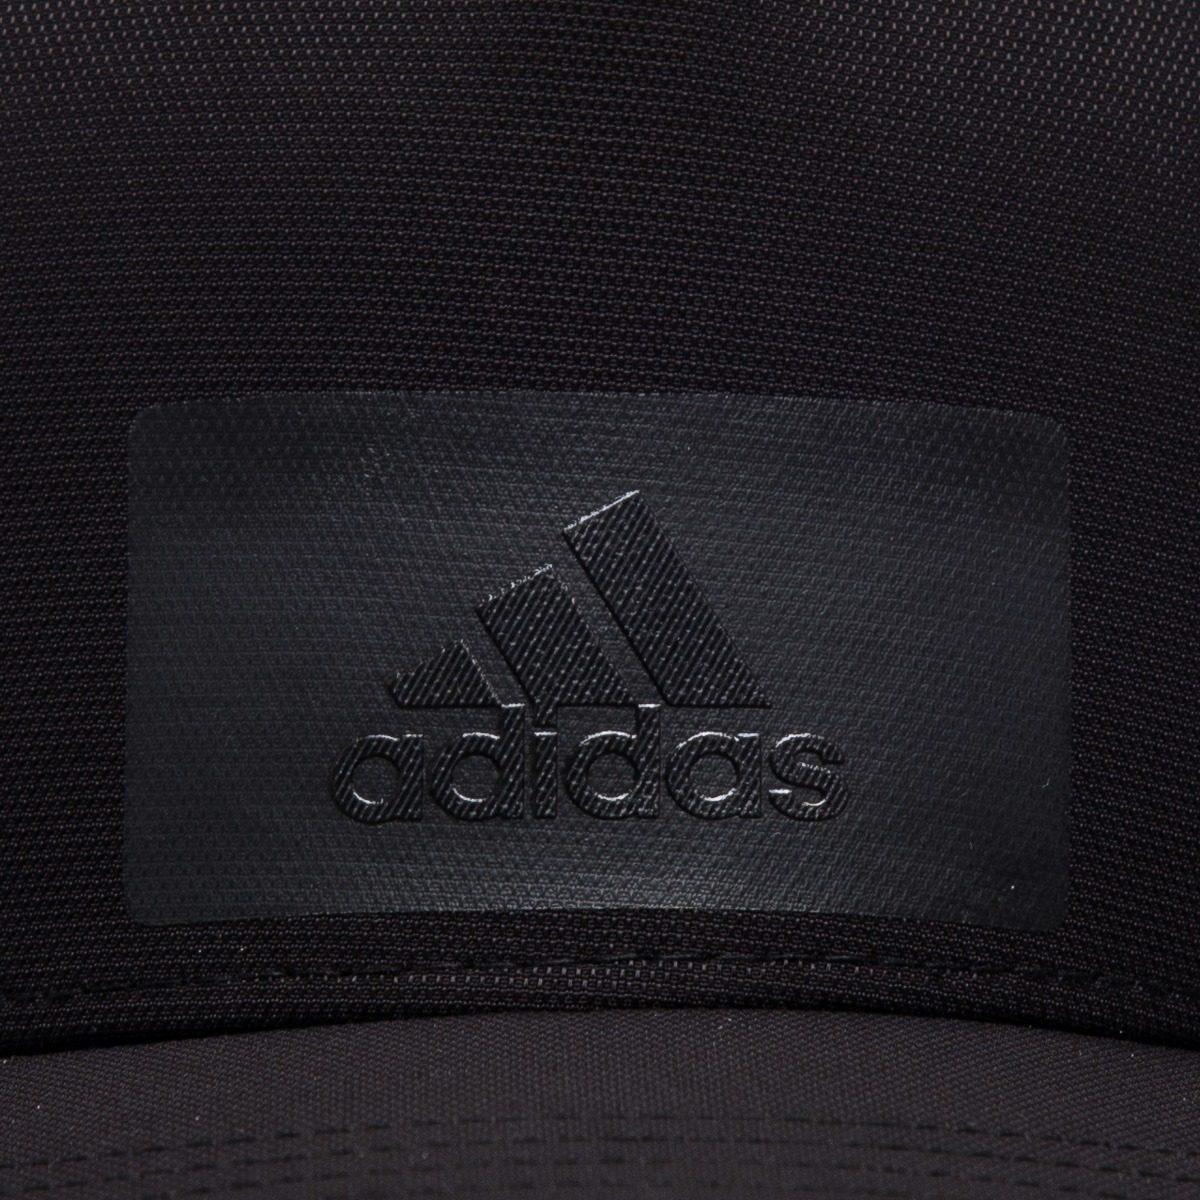 Gorra adidas S16 Zne Logo Ca Unisex Original 100% -   699.00 en ... b0ea68712f8